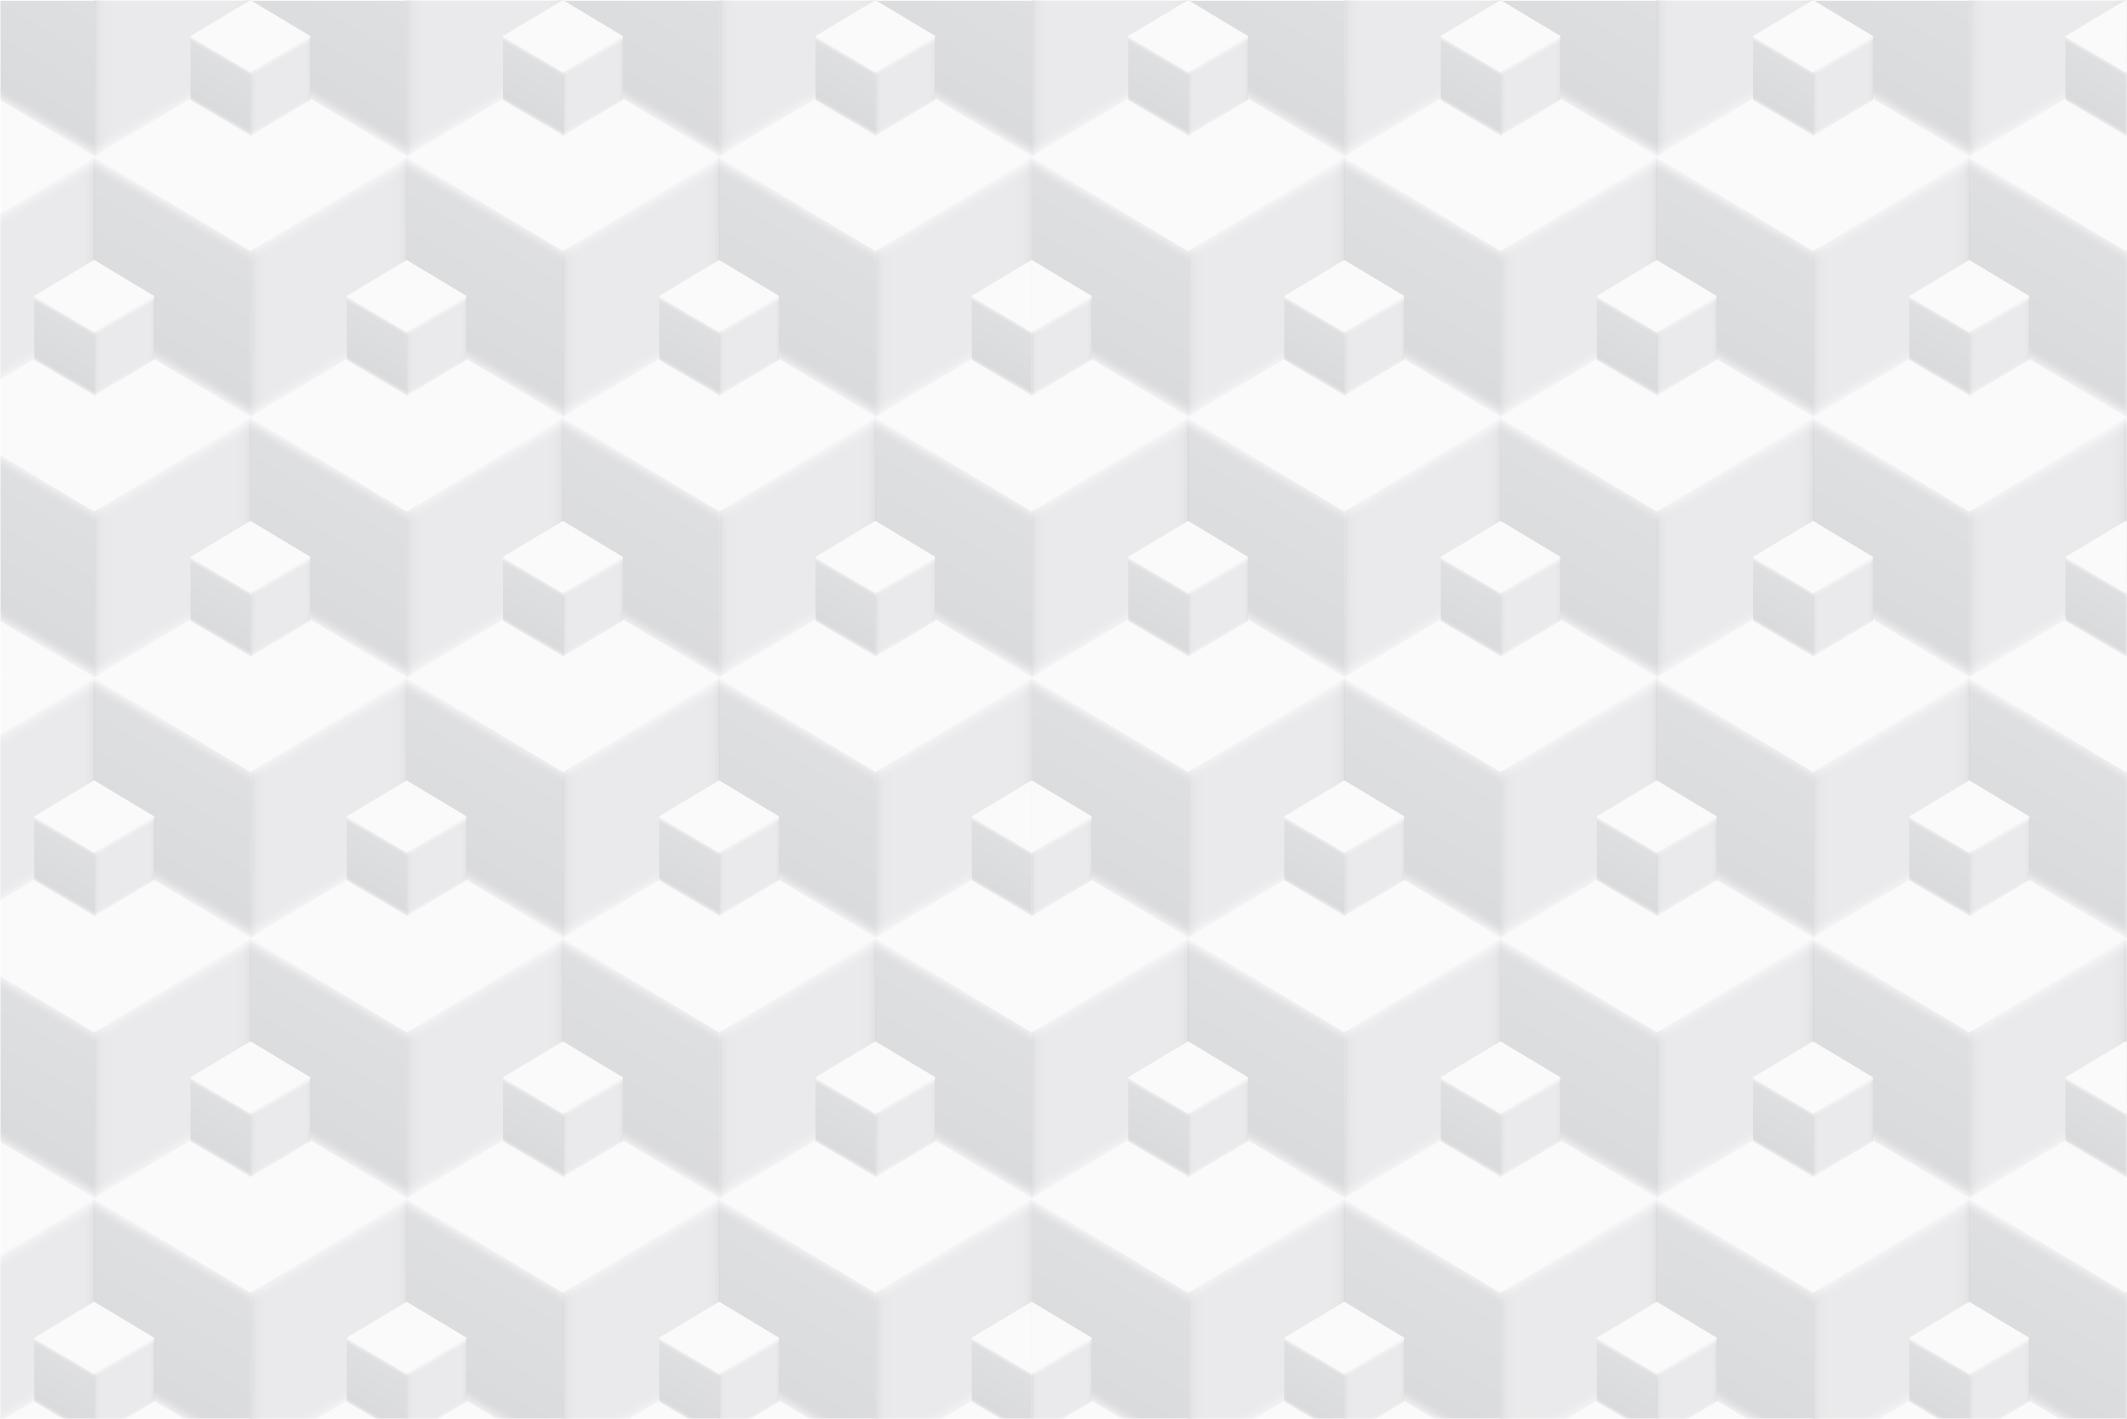 Geometric white 3d seamless textures example image 7